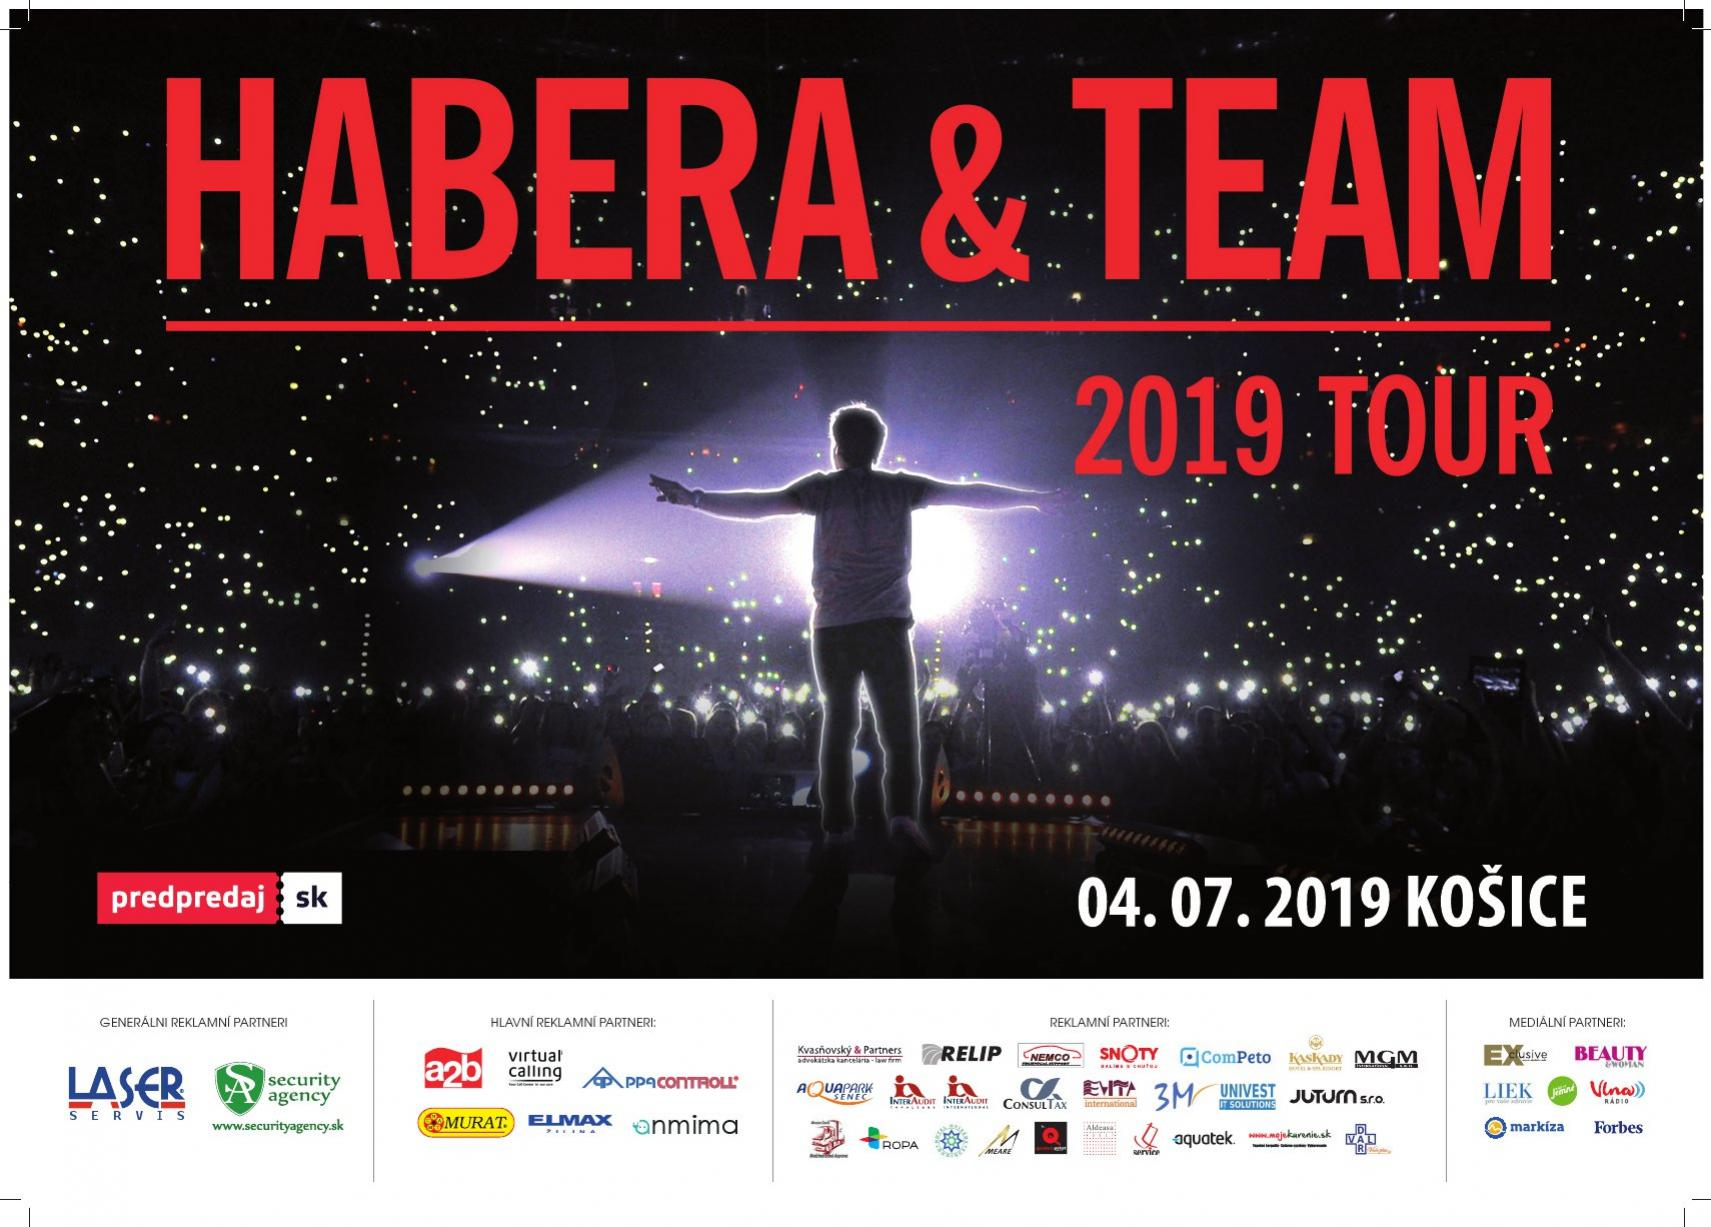 Habera a Team Tour 2019 Košice